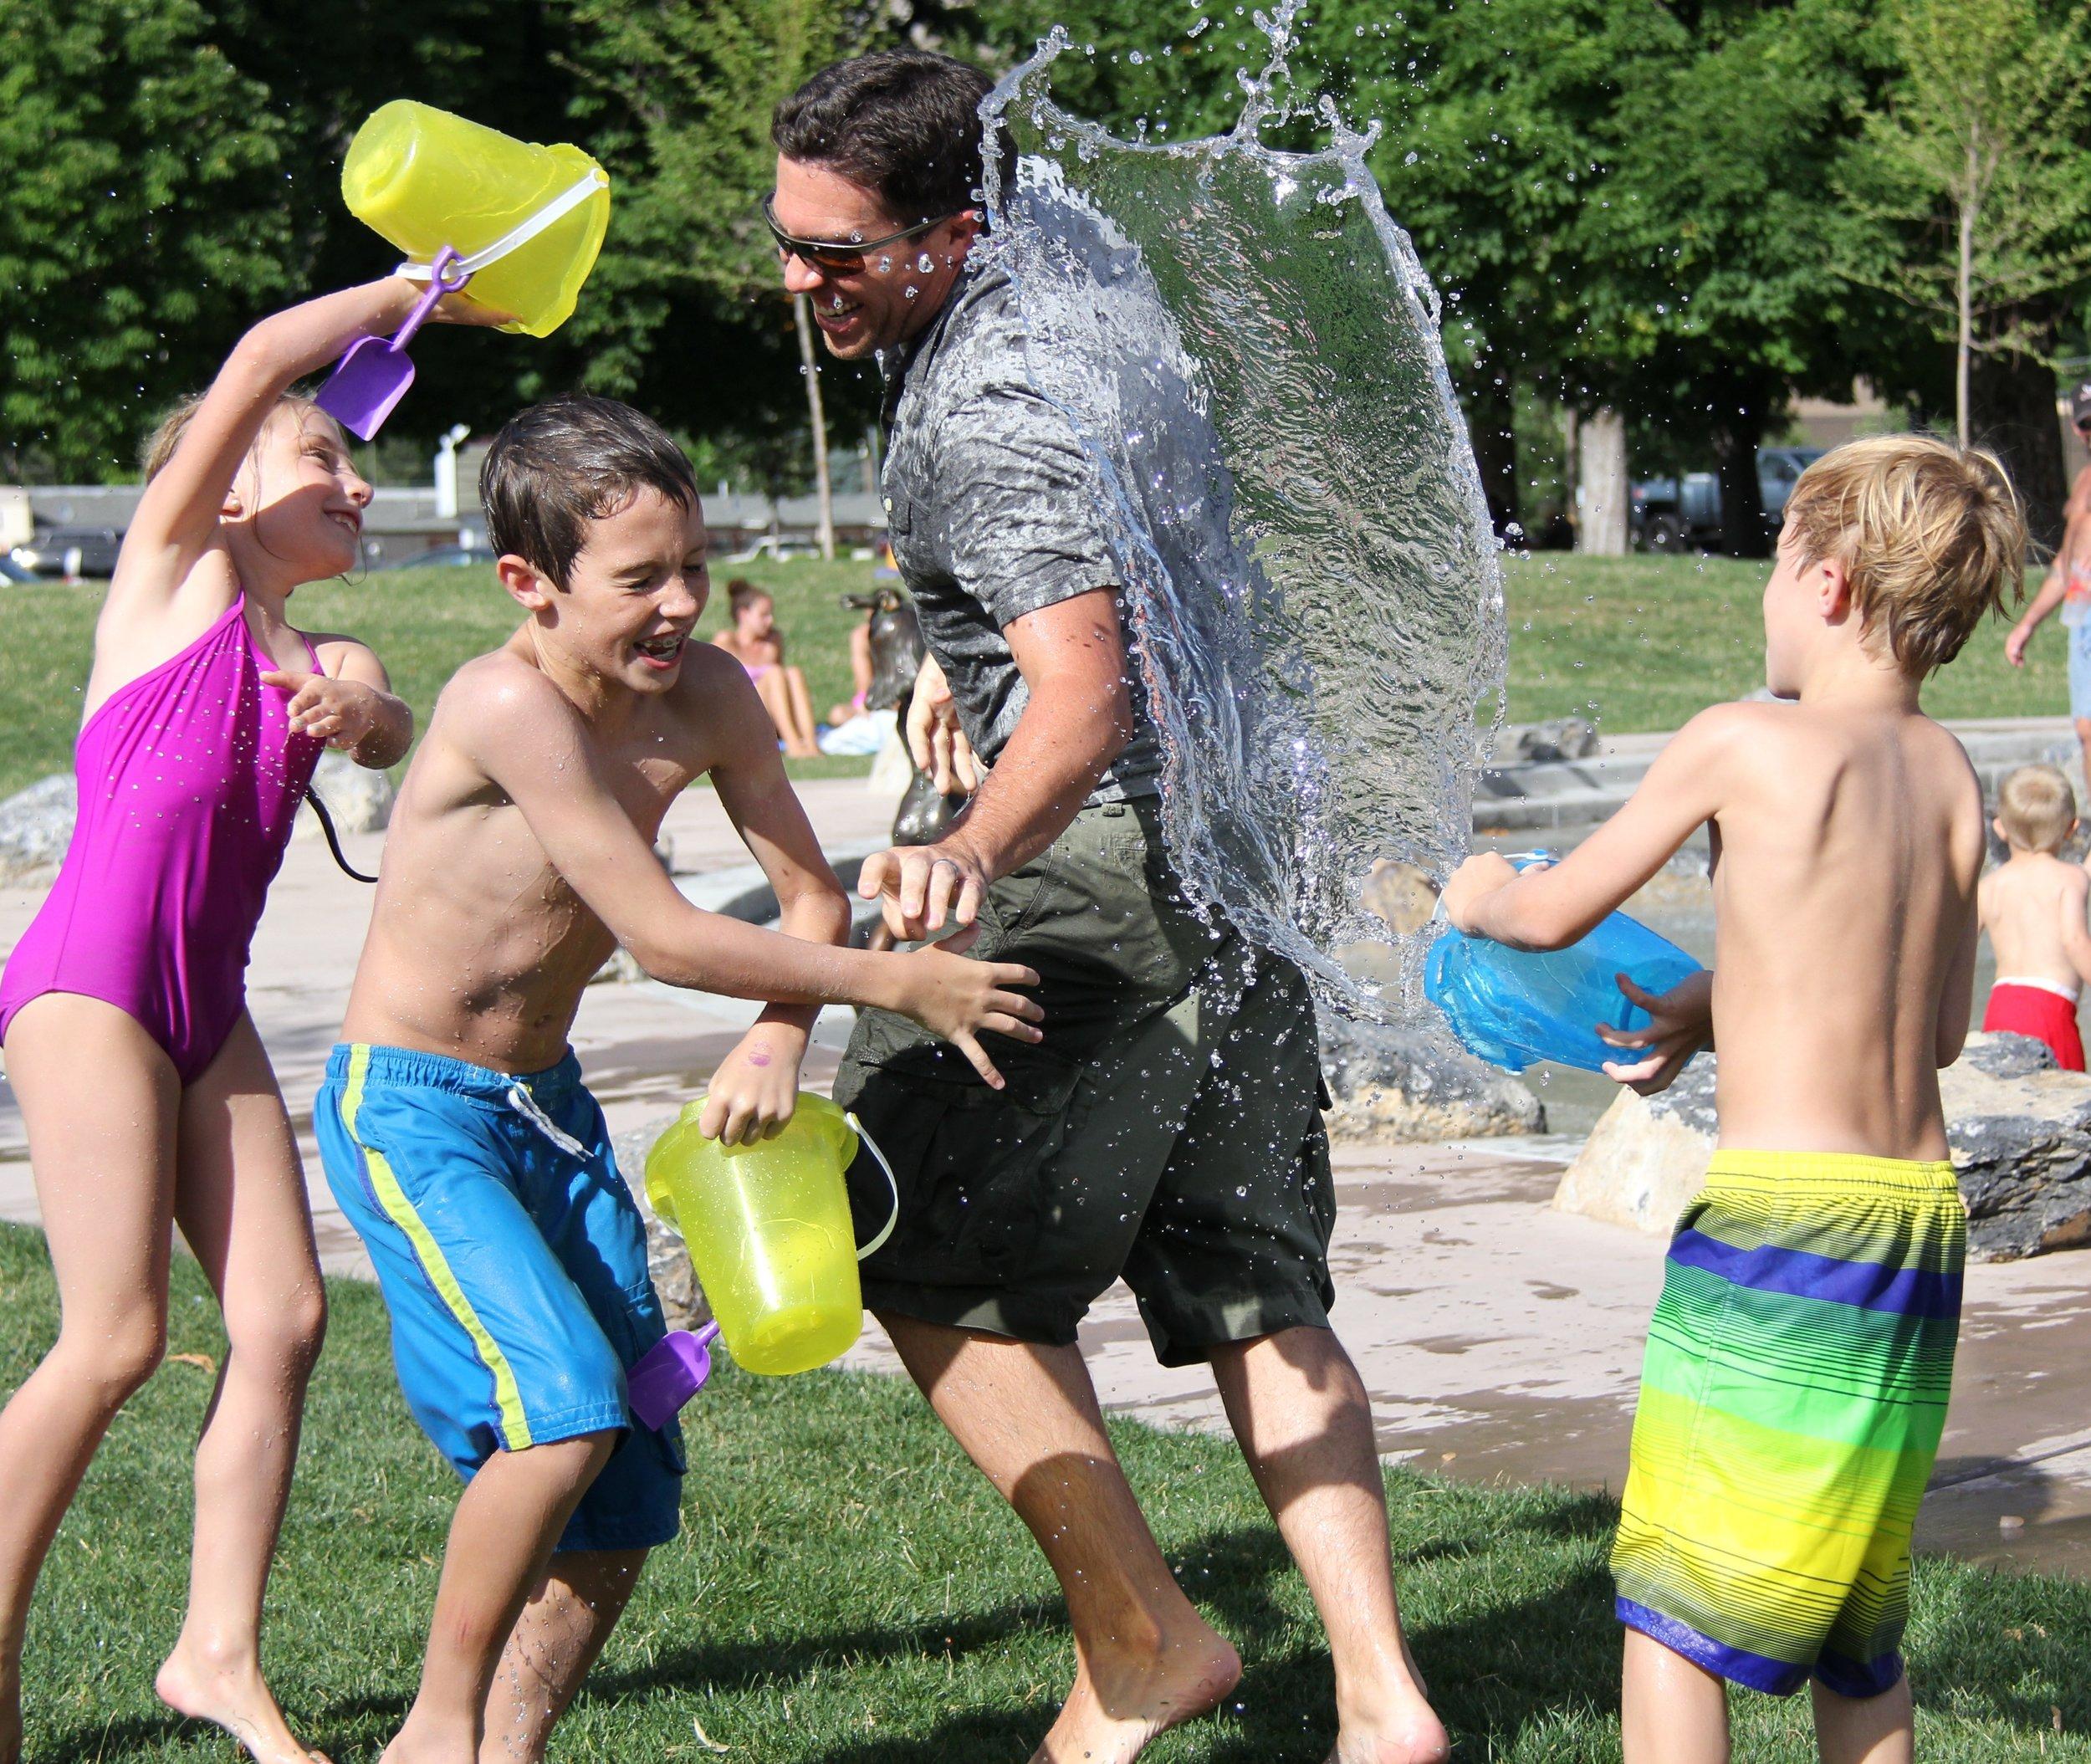 water-fight-children-water-play-51349.jpeg